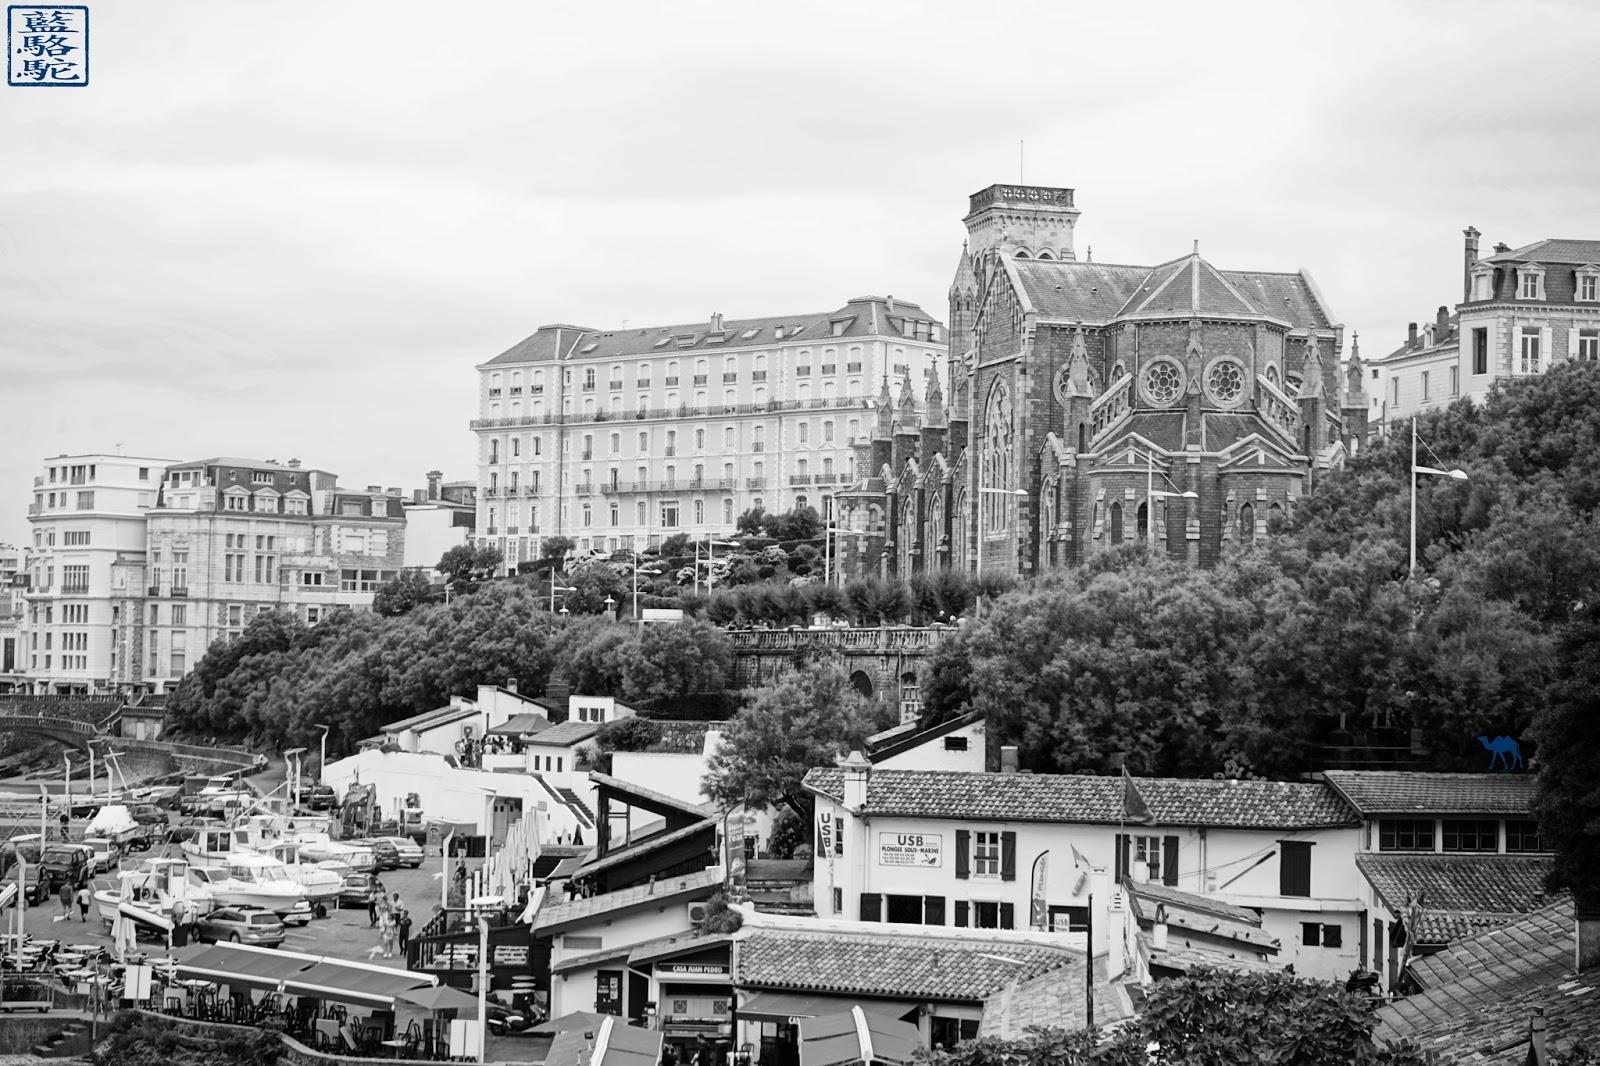 Le Chameau Bleu - Biarritz - église Sainte Eugénie - BAB